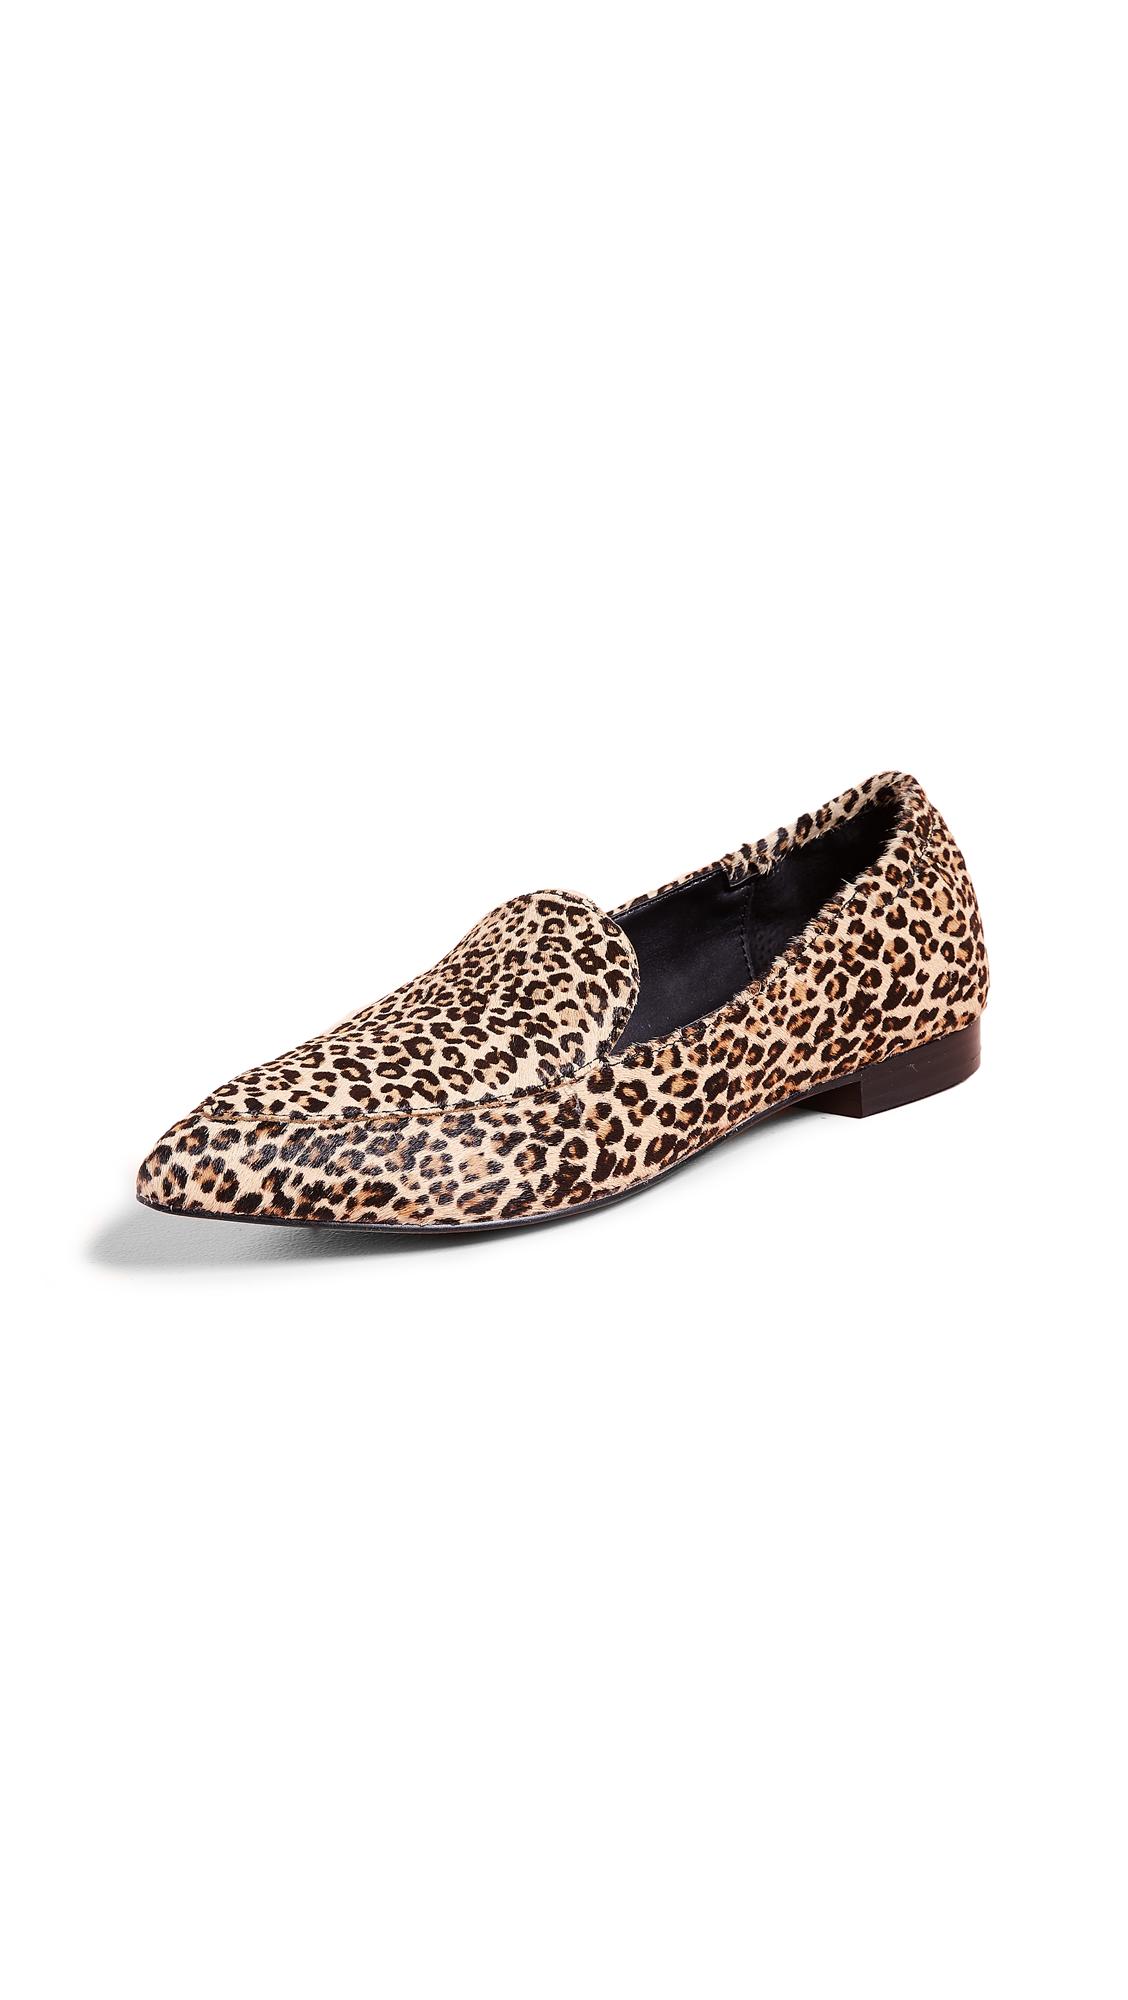 Dolce Vita Wanita Point Toe Loafers - Leopard